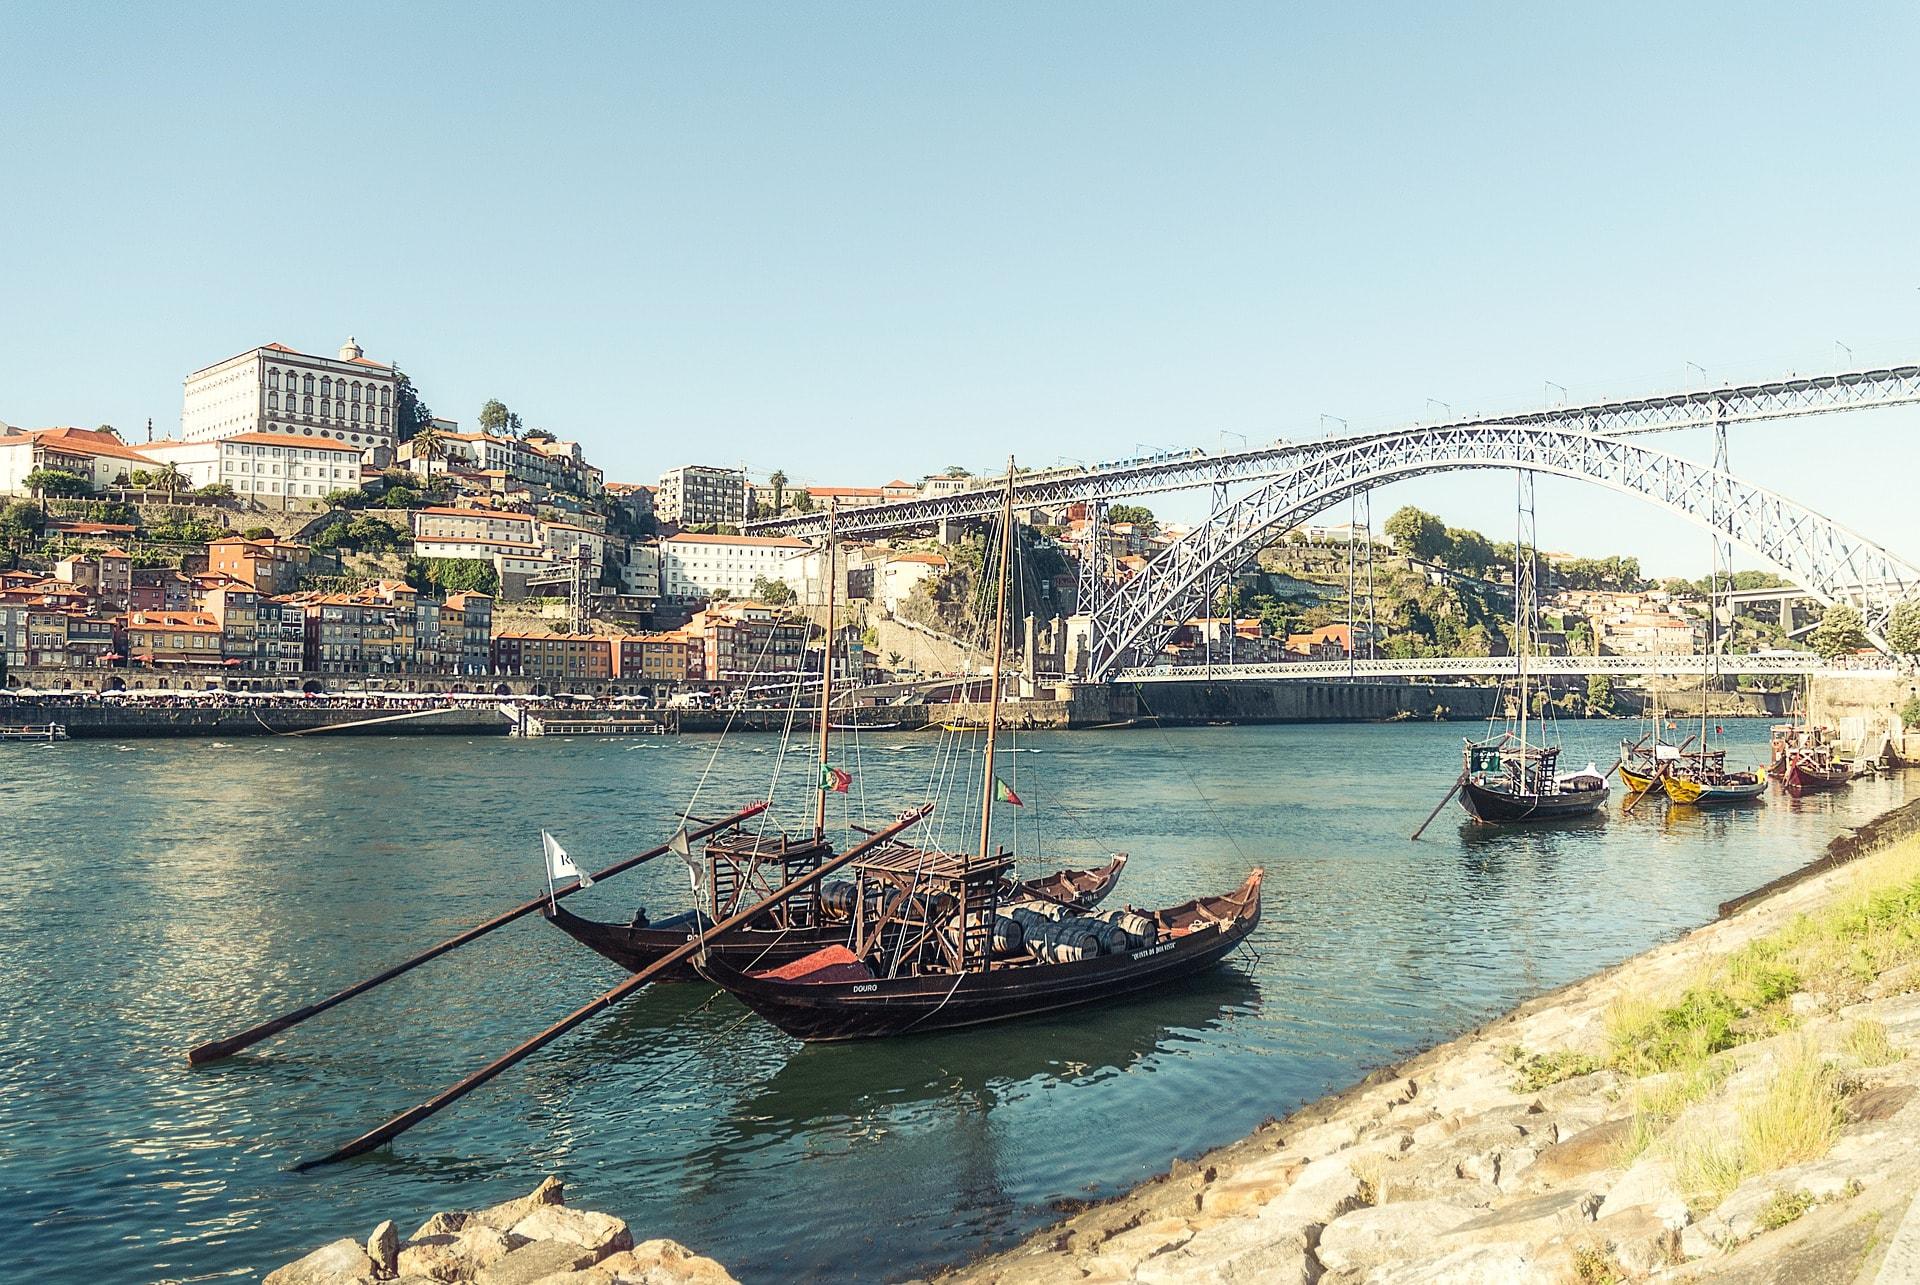 Les incontournables de Porto